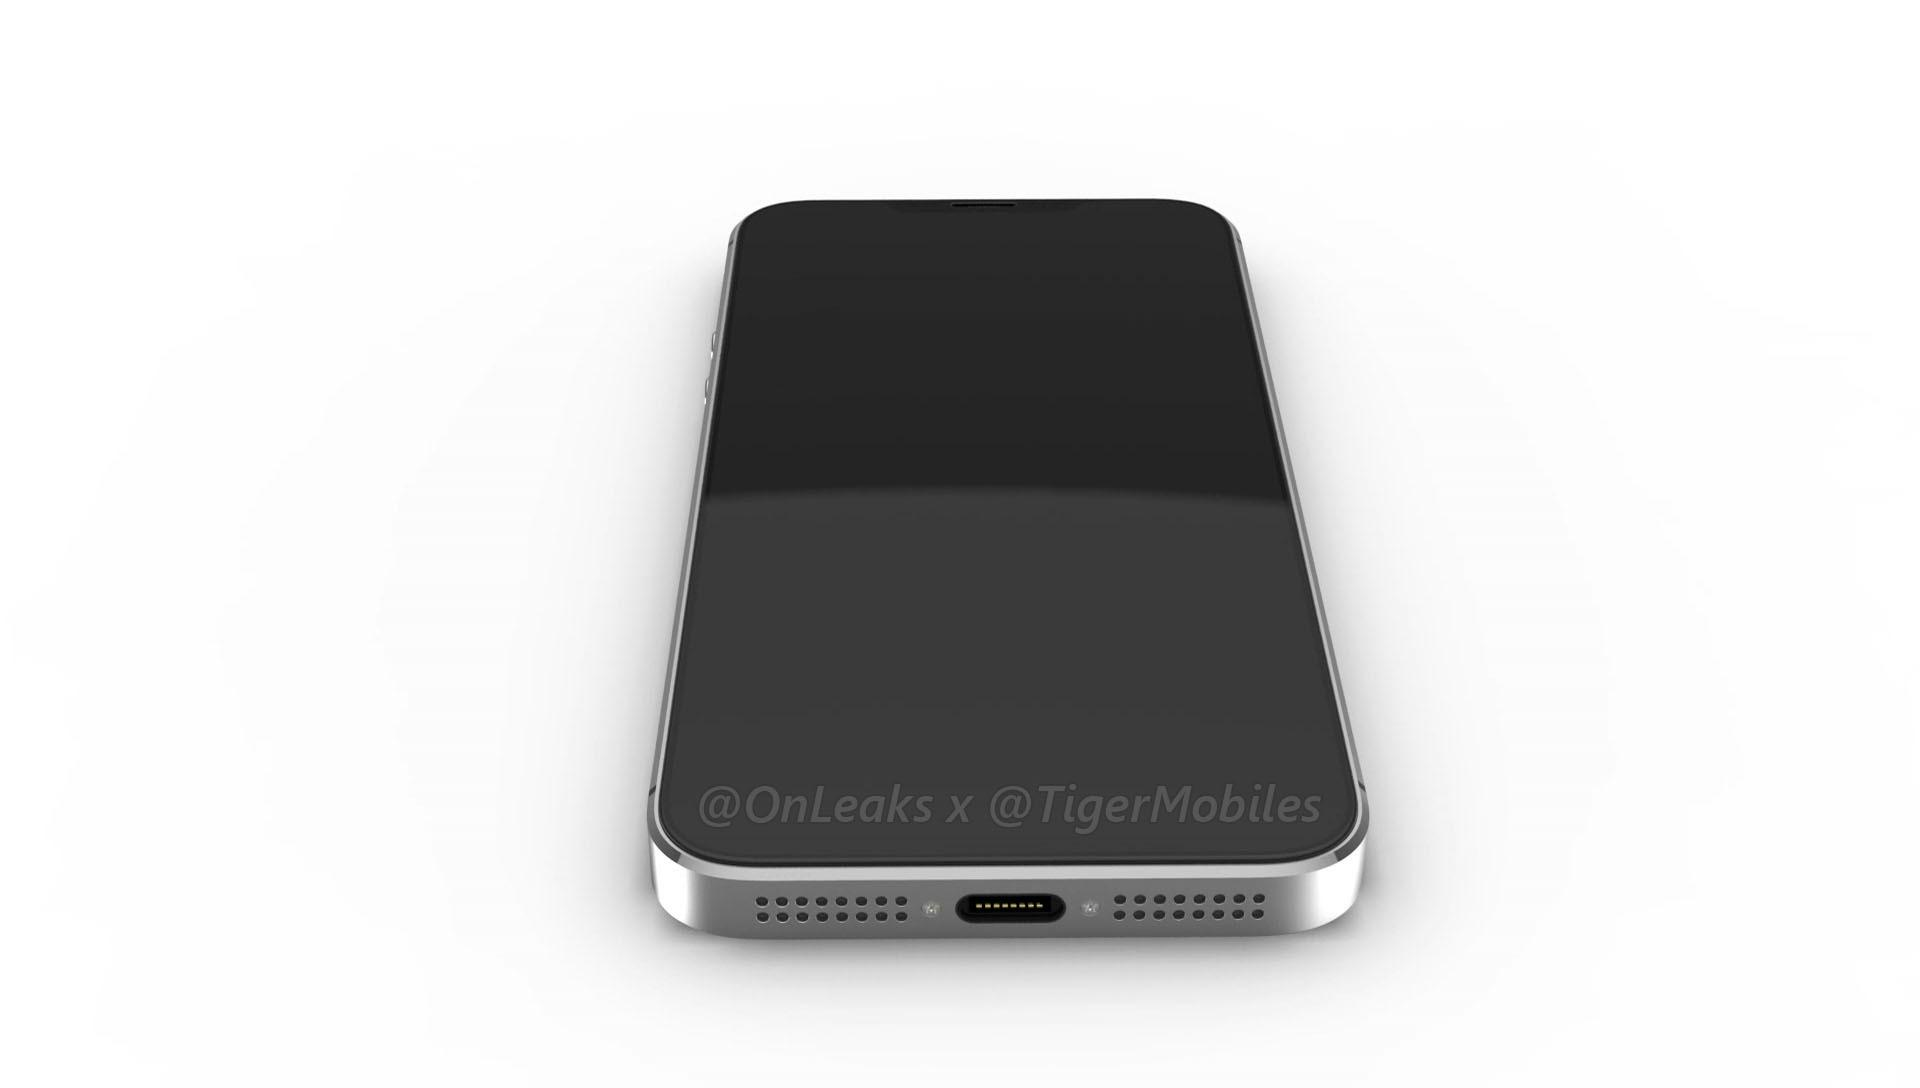 Apple reports $13.8B profit, despite slow iPhone sales